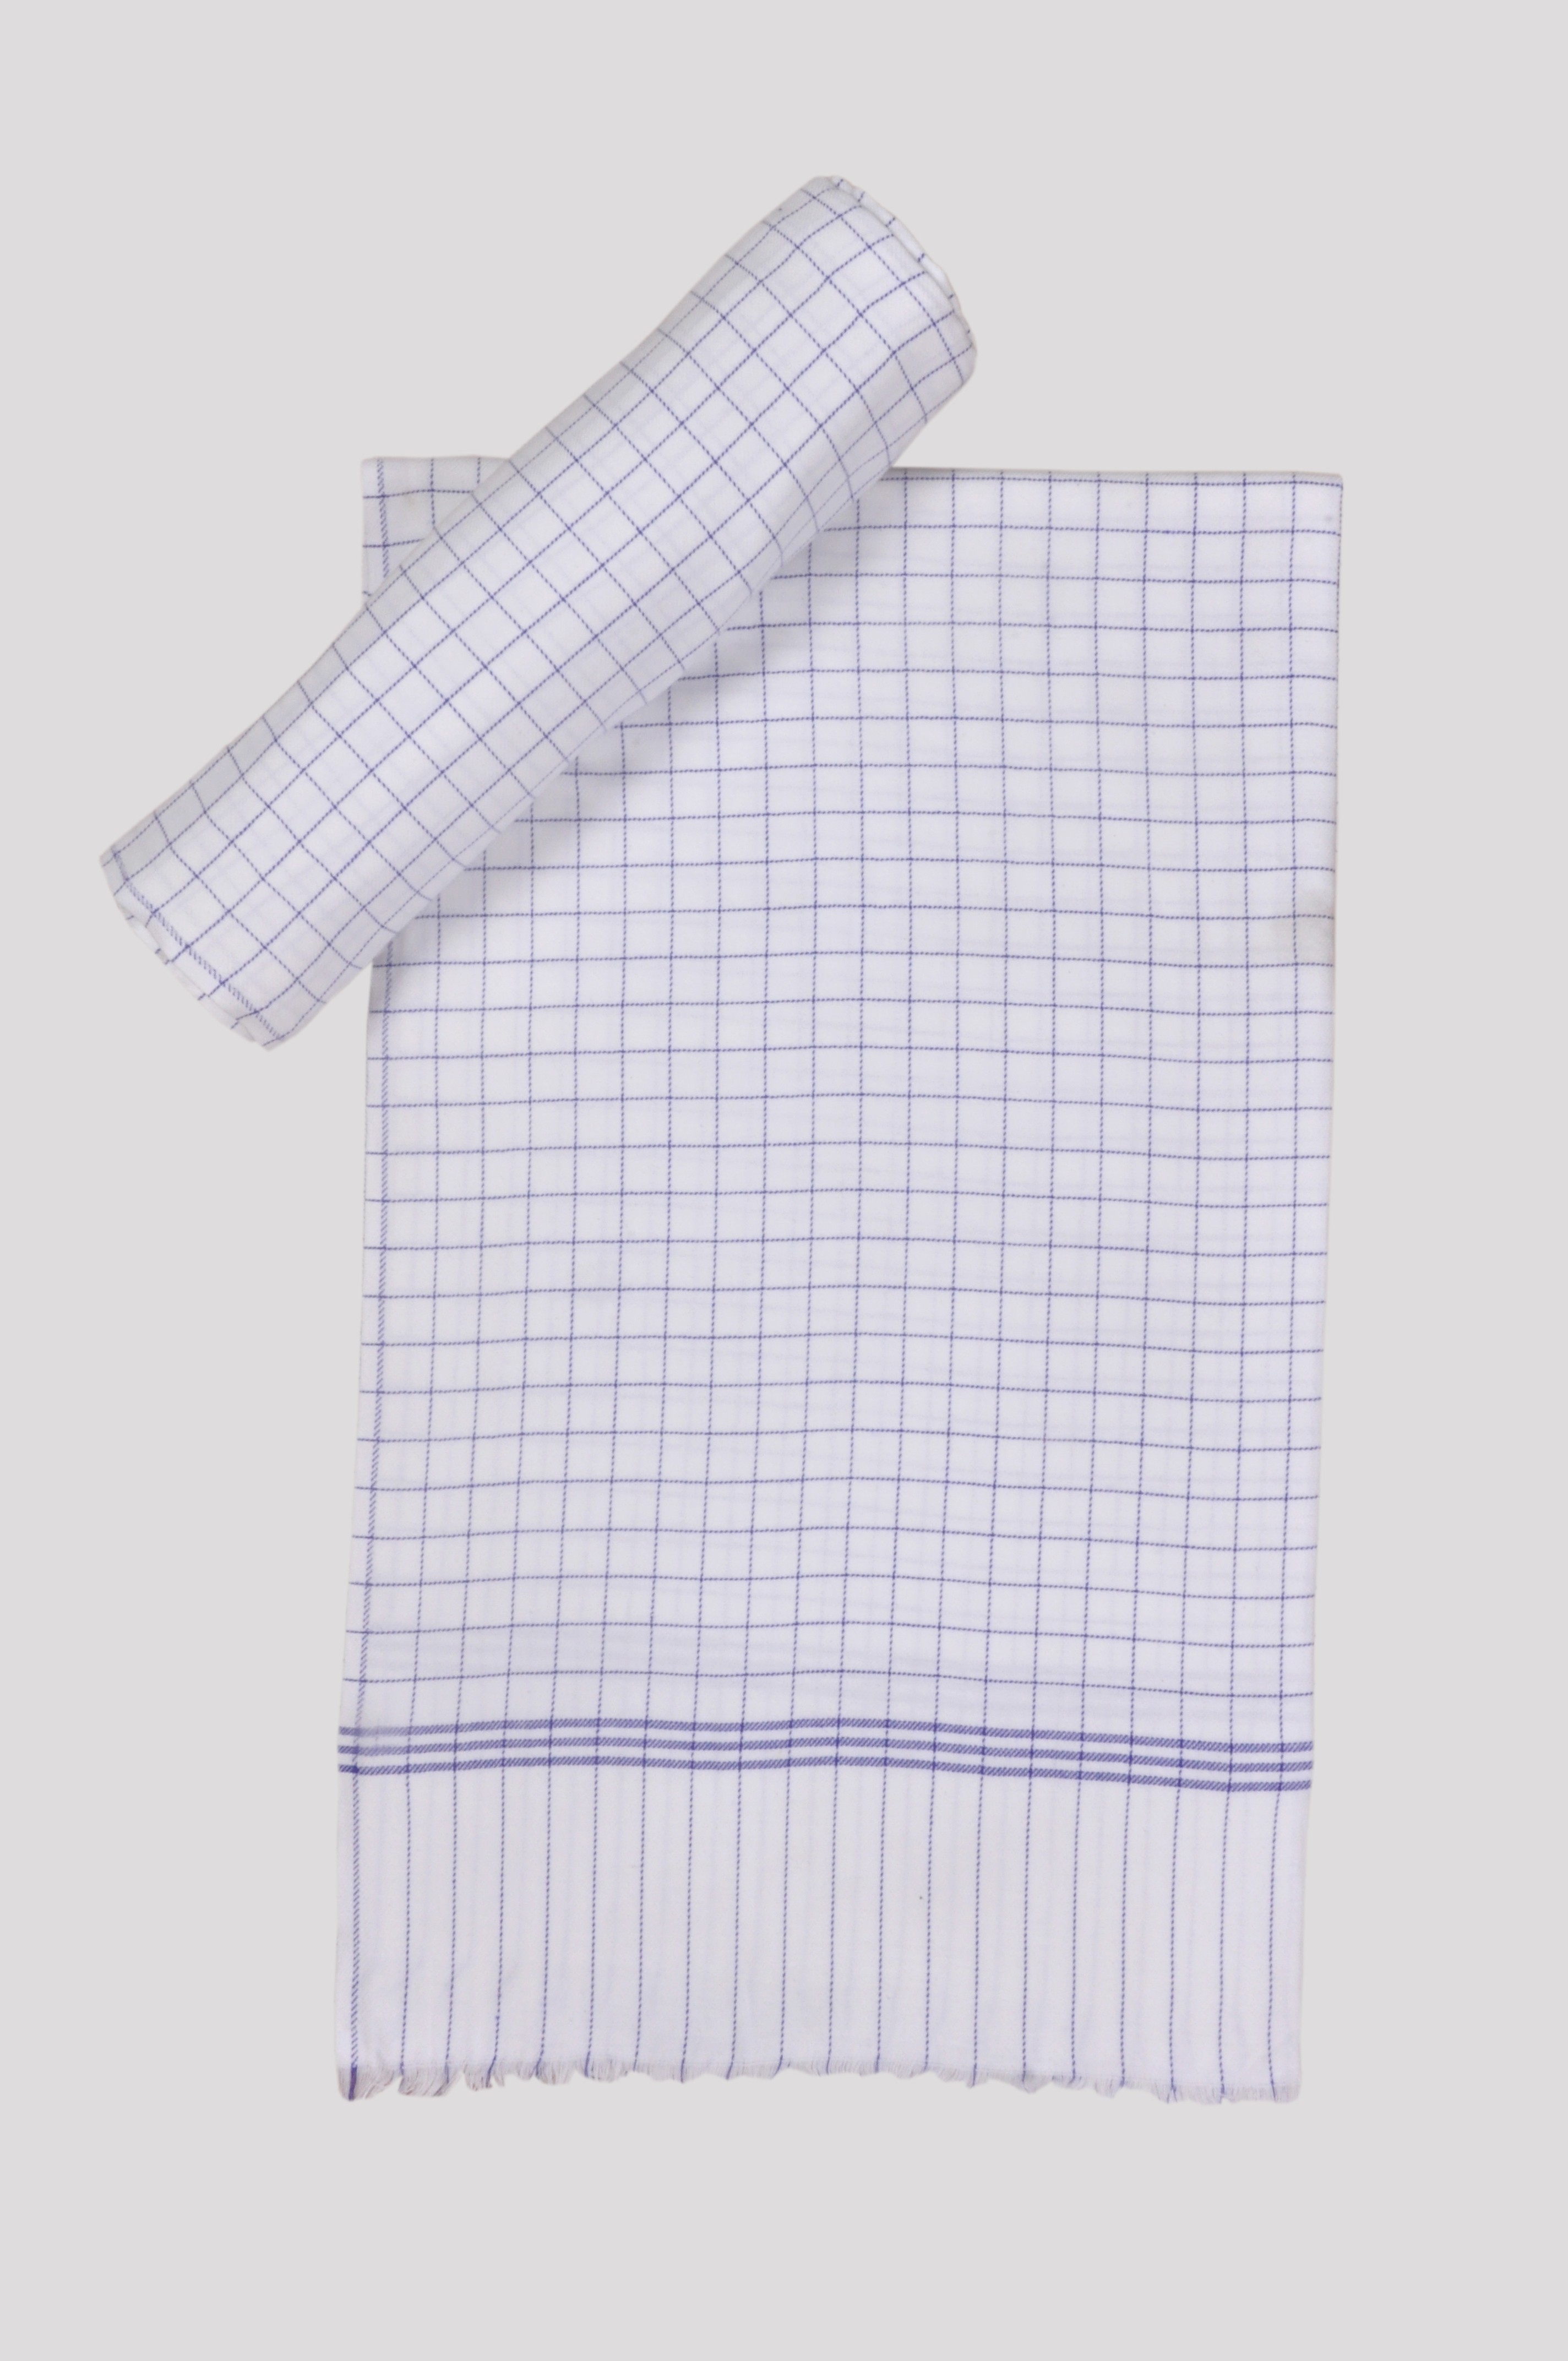 Jass Home Decor Checkered Single Blanket Blue(AC Blanket, Set of 2 Blanket)